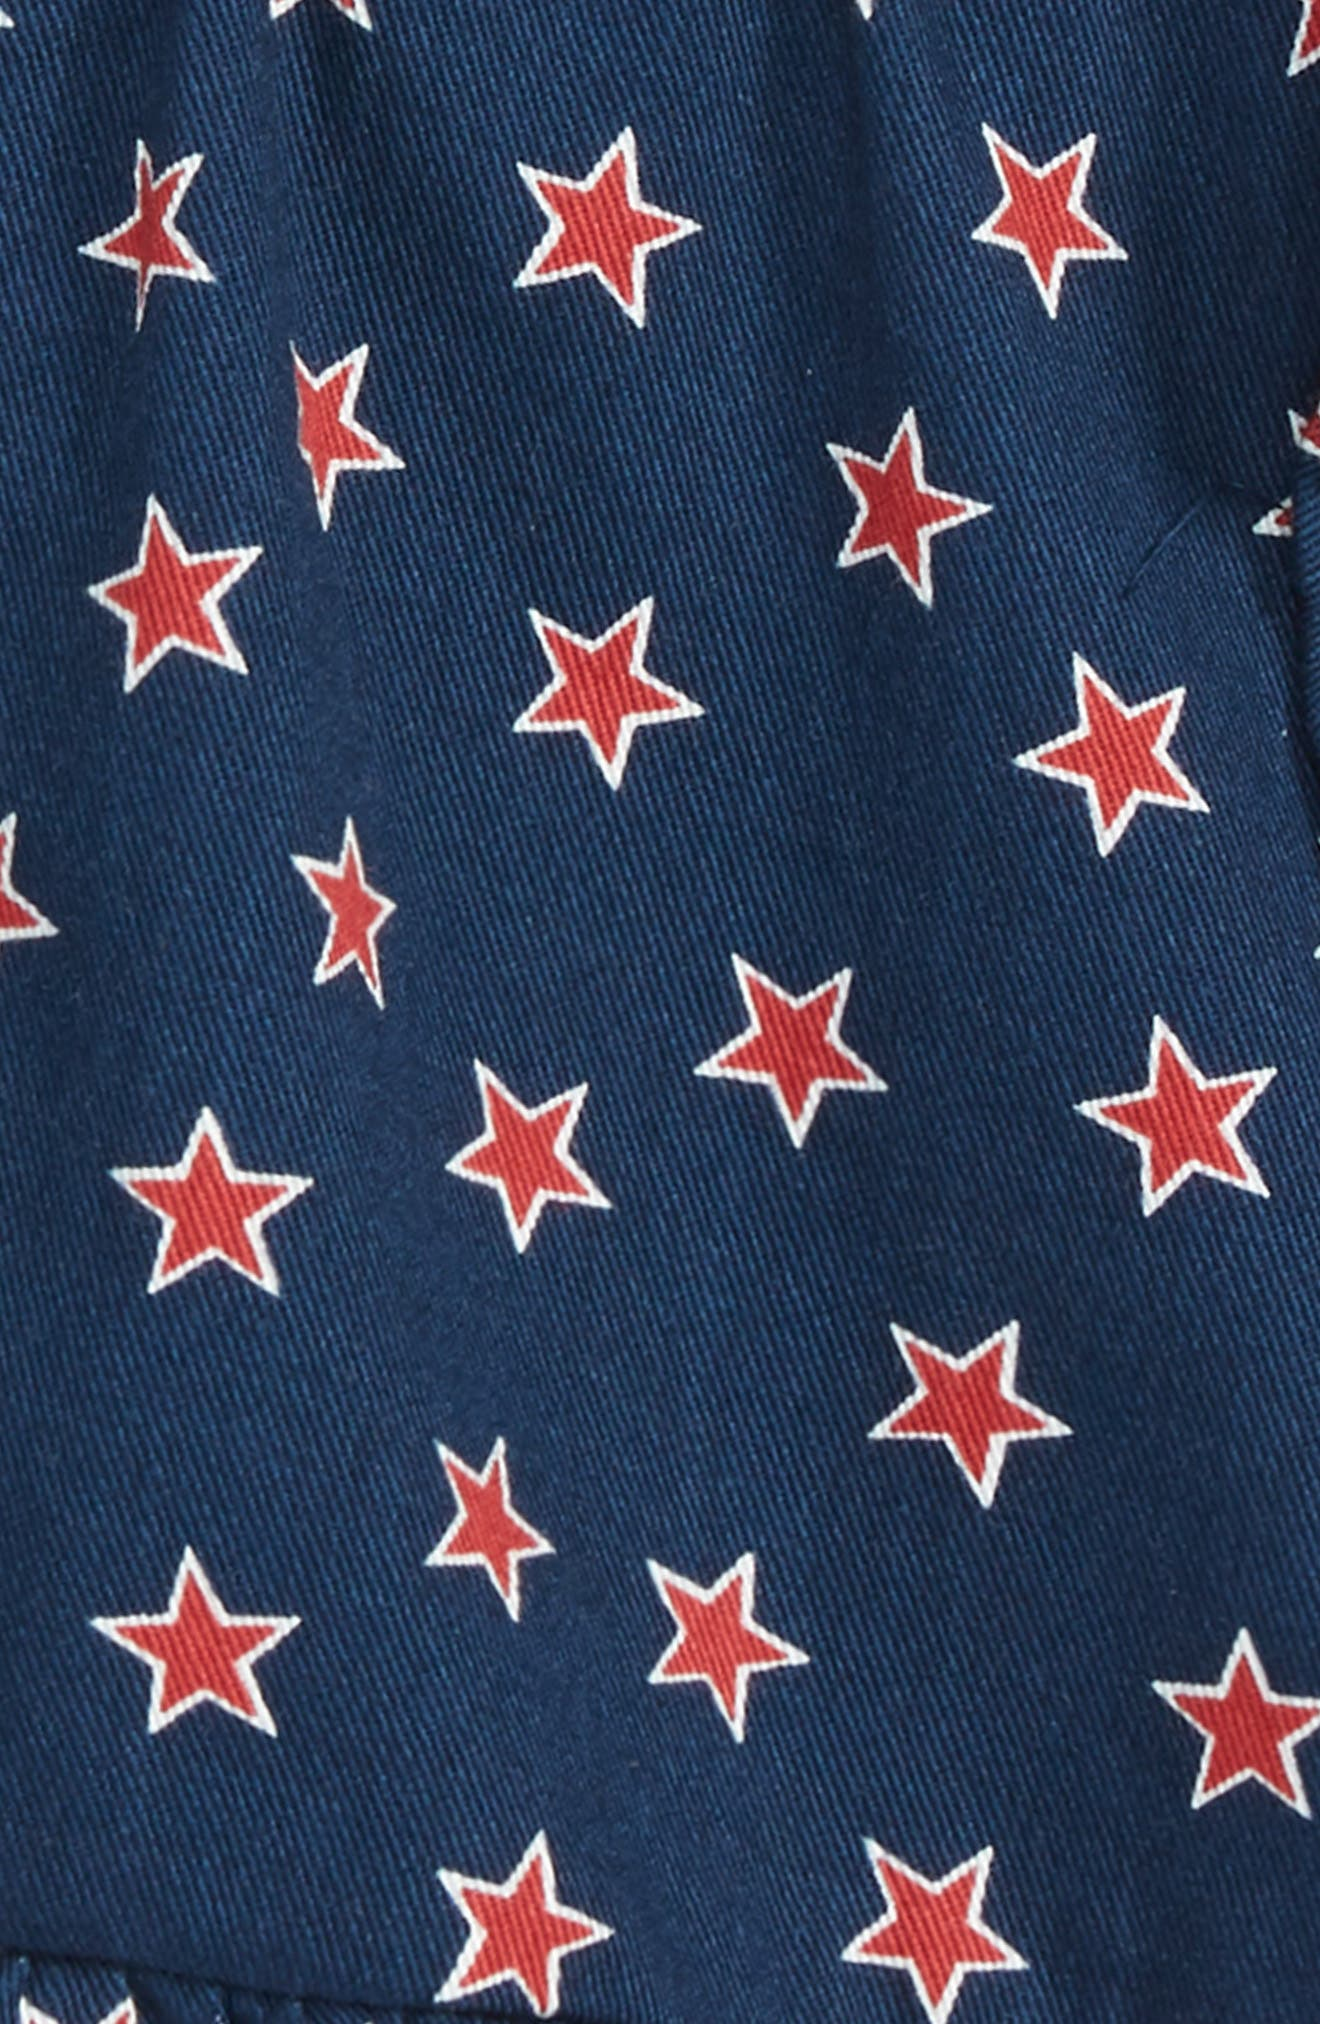 Star Print Ruffle Pull-On Shorts,                             Alternate thumbnail 2, color,                             Dark Indigo